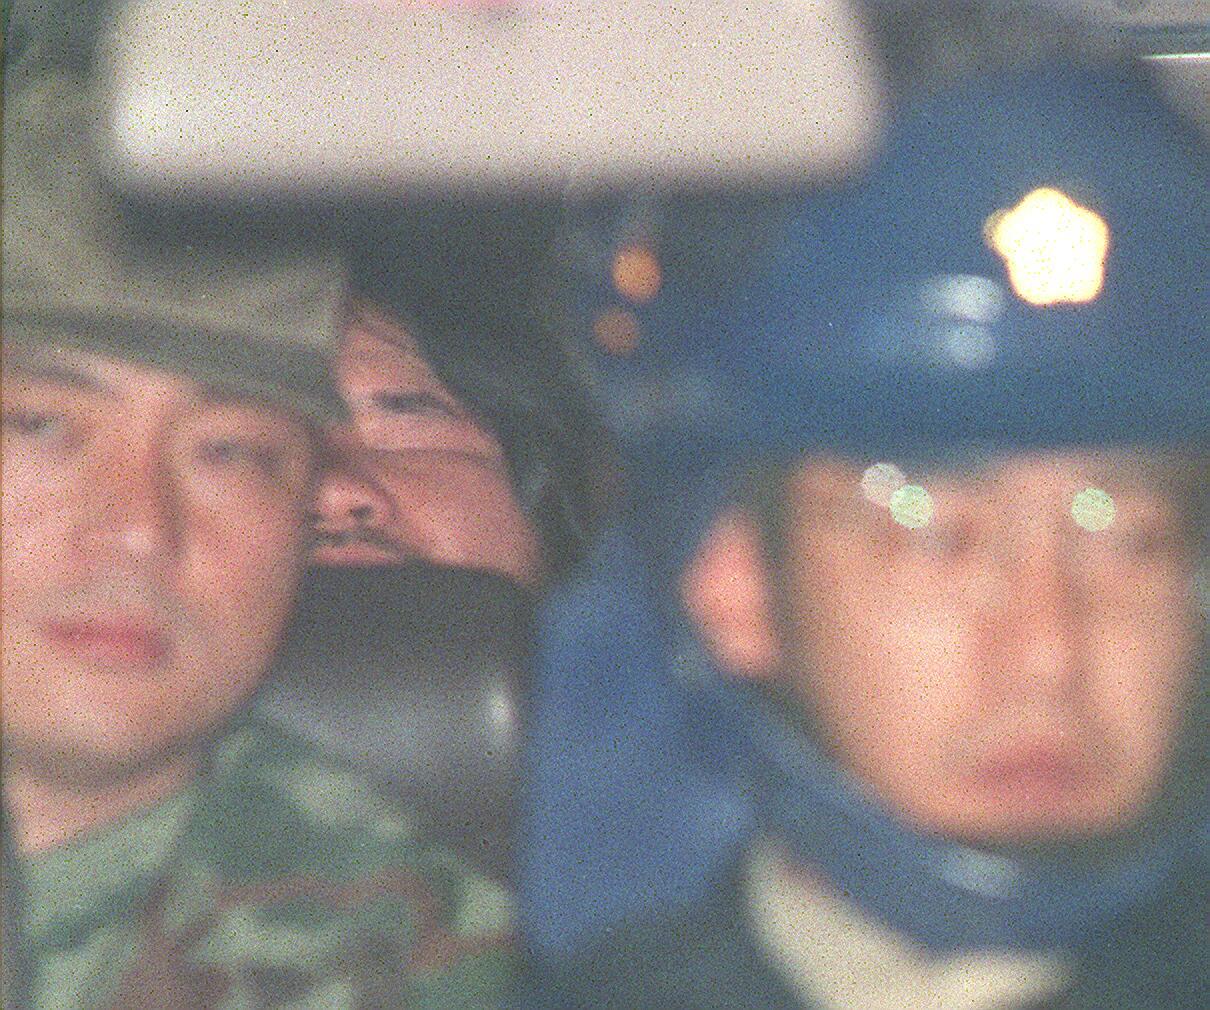 Aum Shinrikyo Cult Leader Shoko Asahara Executed 23 Years After Deadly Tokyo Sarin Attacks